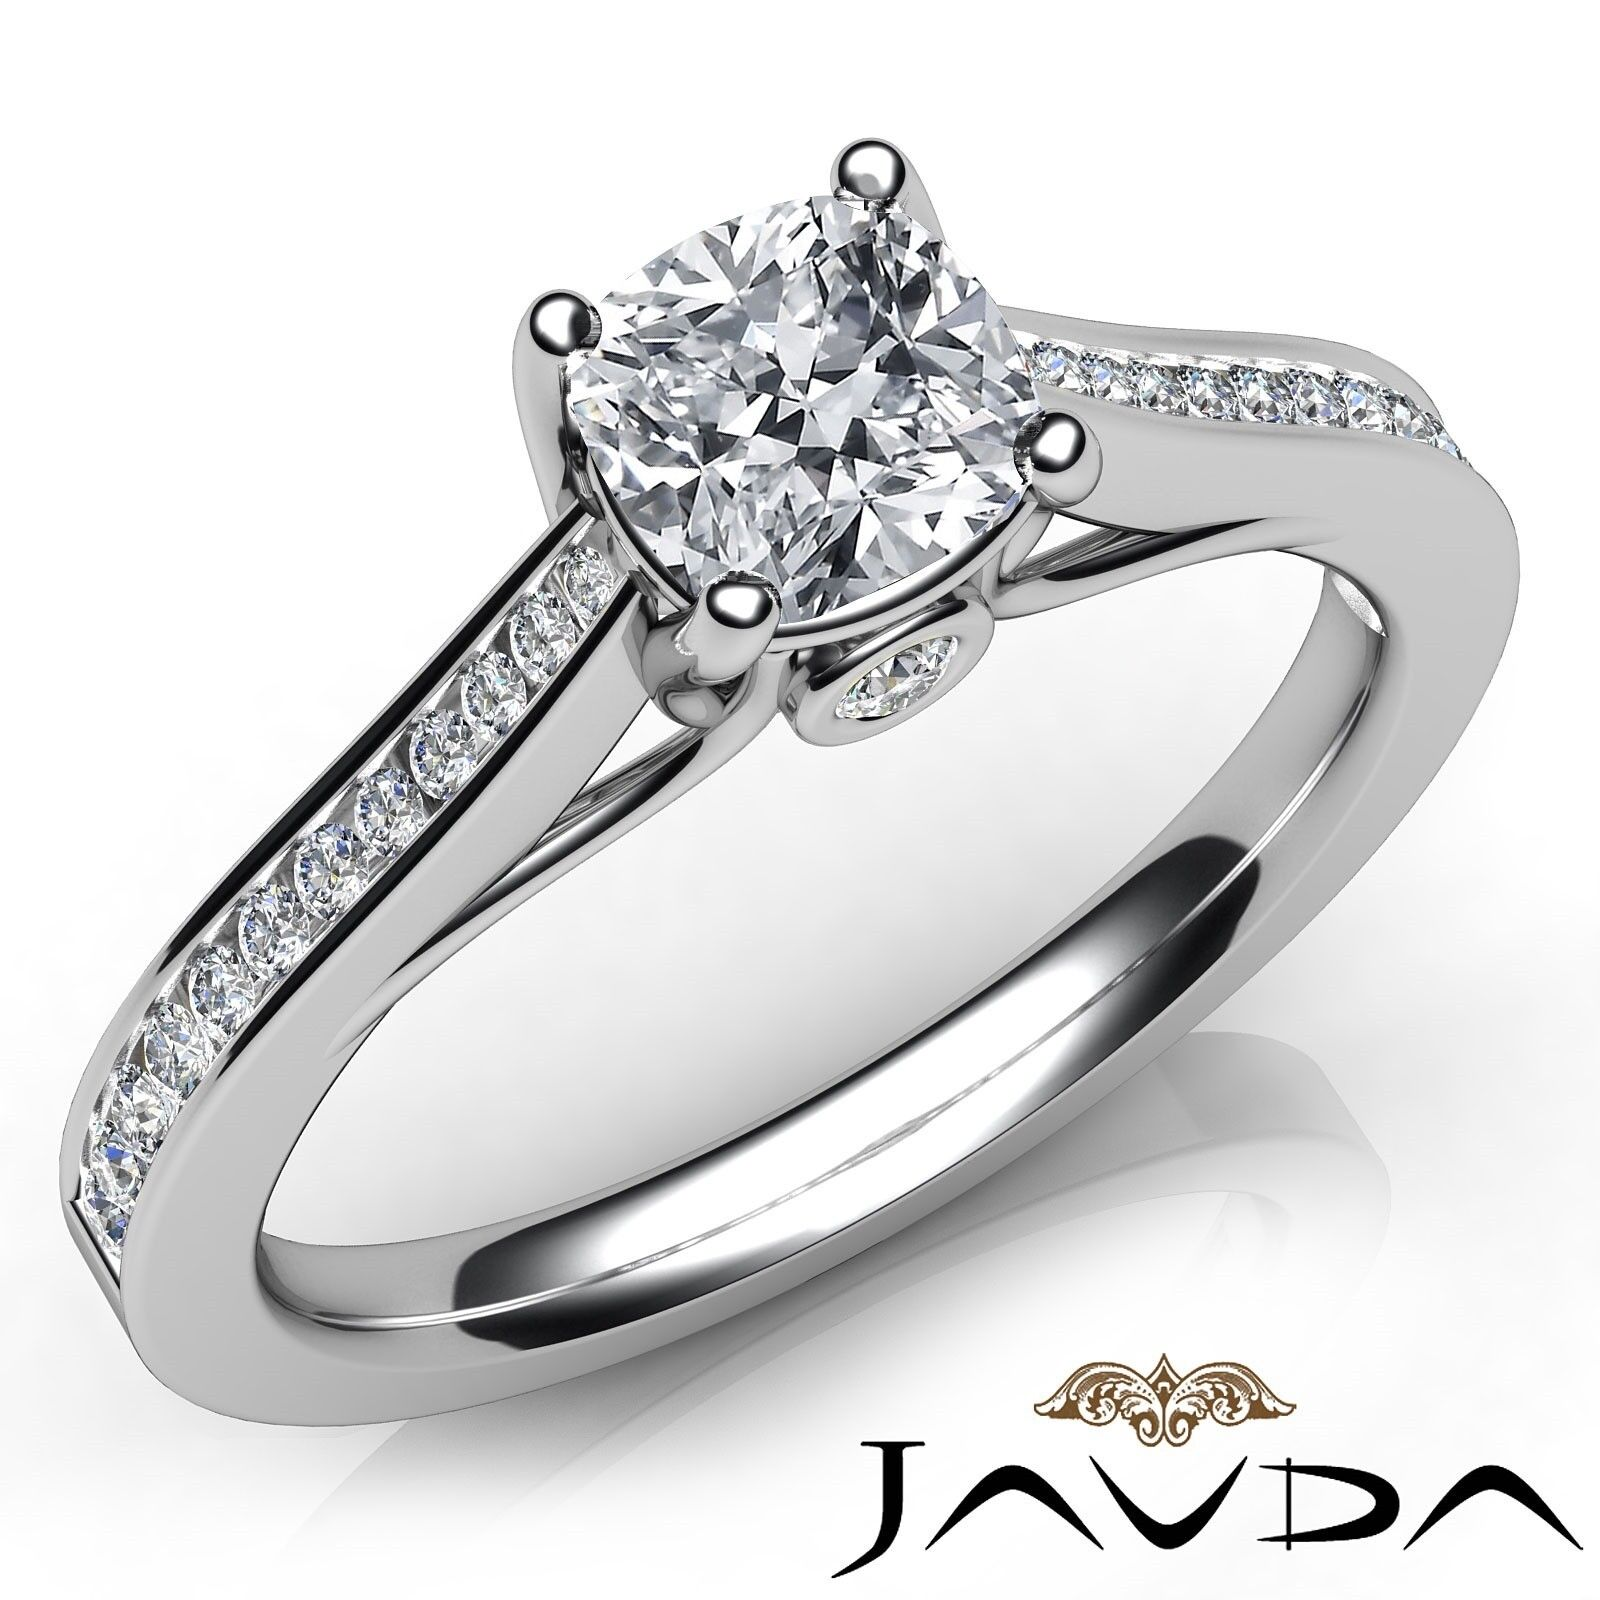 1ct Channel Bezel Prong Set Cushion Diamond Engagement Ring GIA E-VS1 White Gold